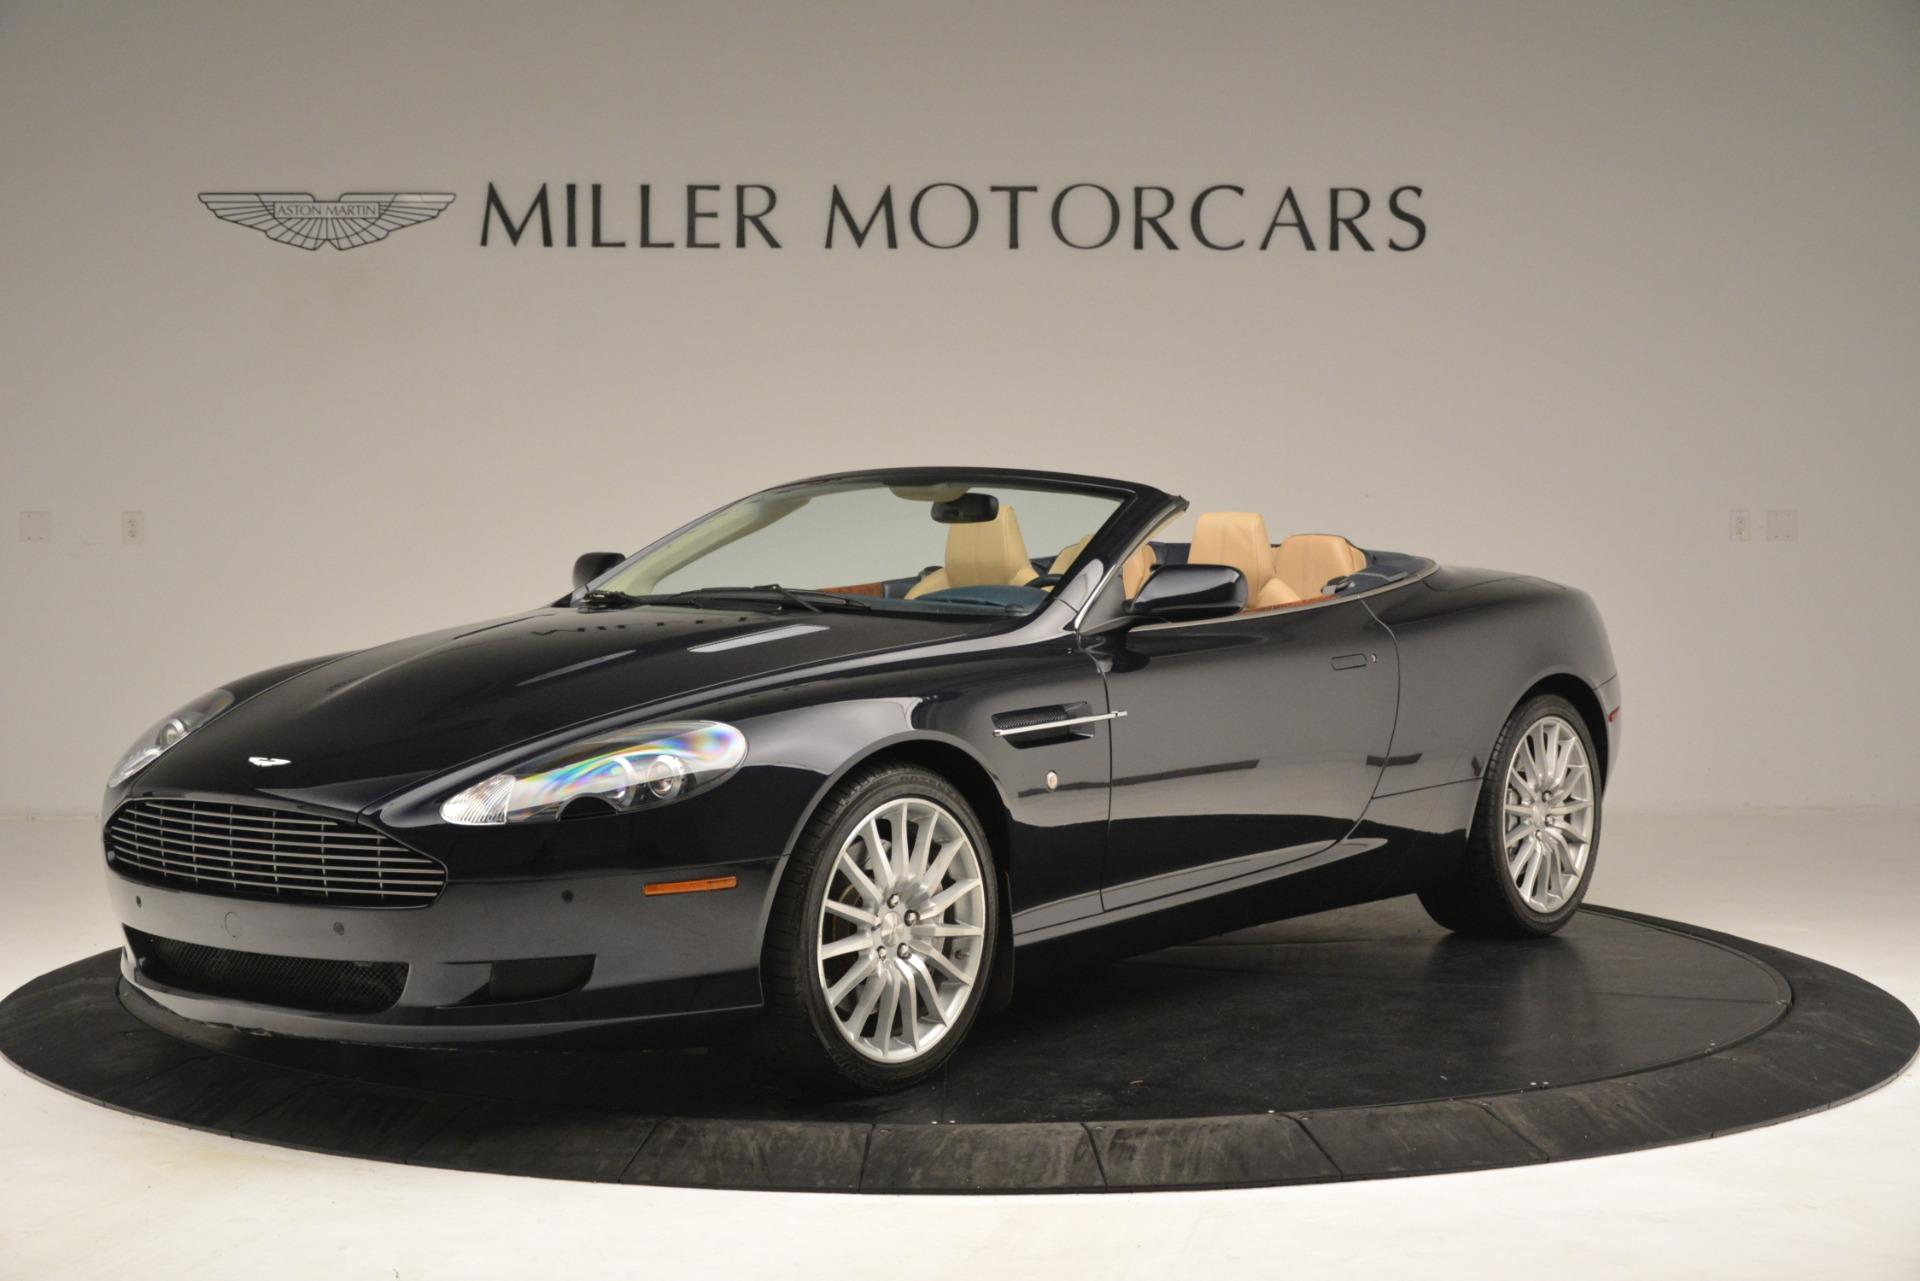 Used 2007 Aston Martin DB9 Convertible for sale Sold at Bugatti of Greenwich in Greenwich CT 06830 1